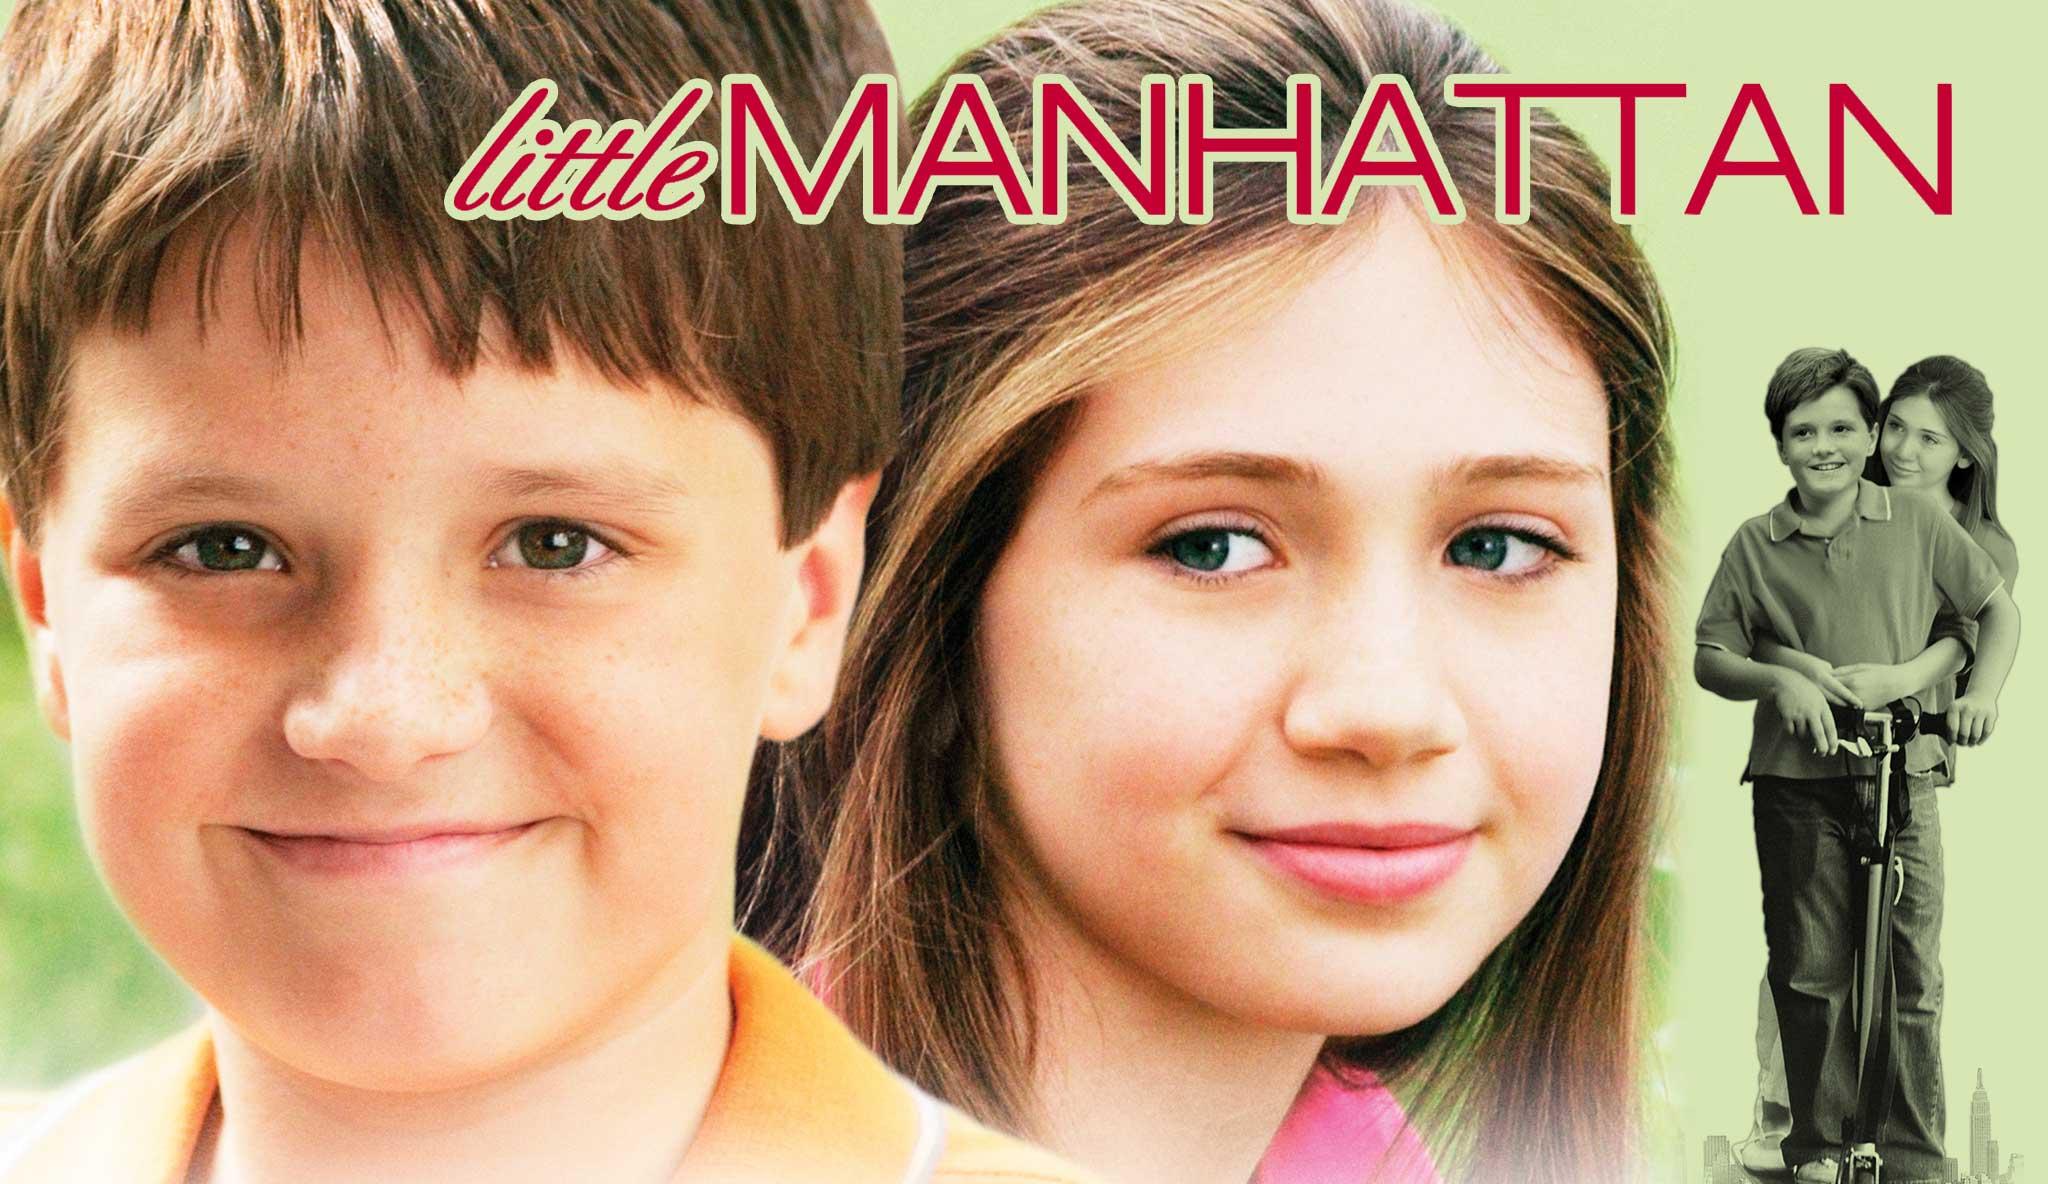 little-manhattan\header.jpg